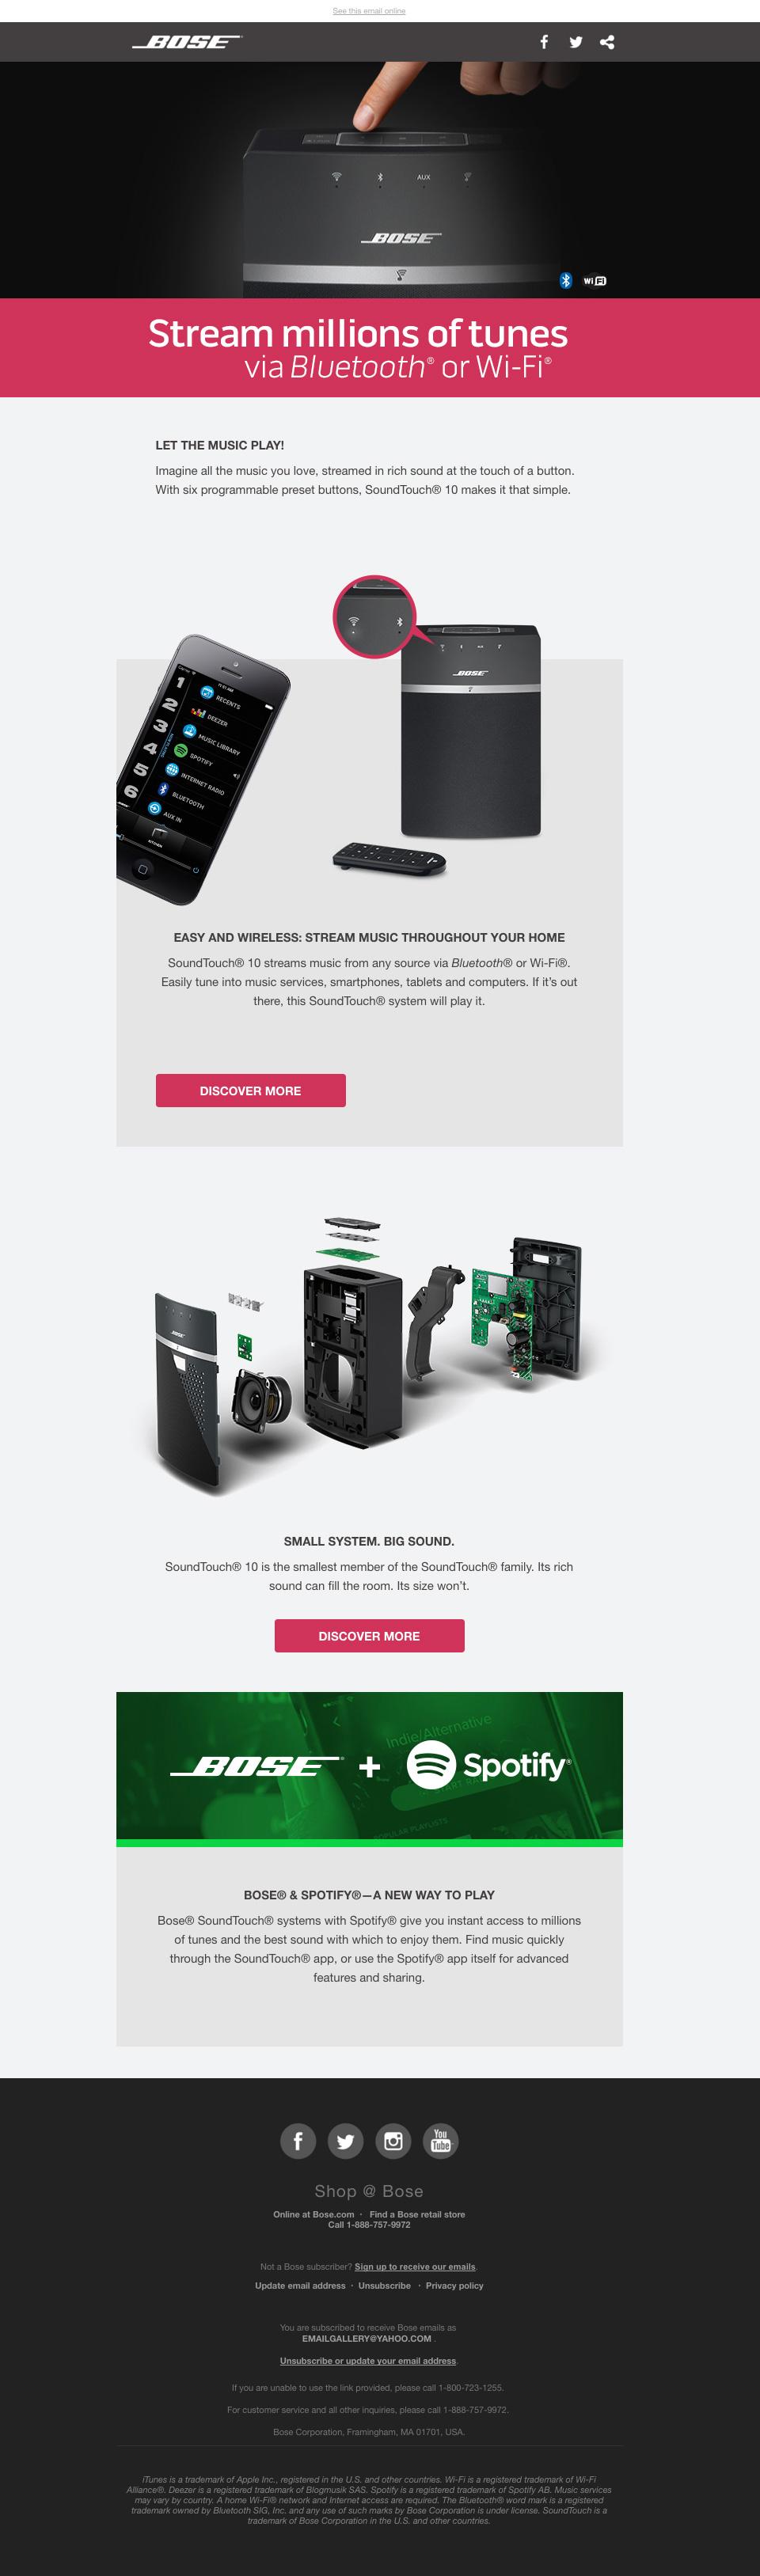 bose-speaker-email